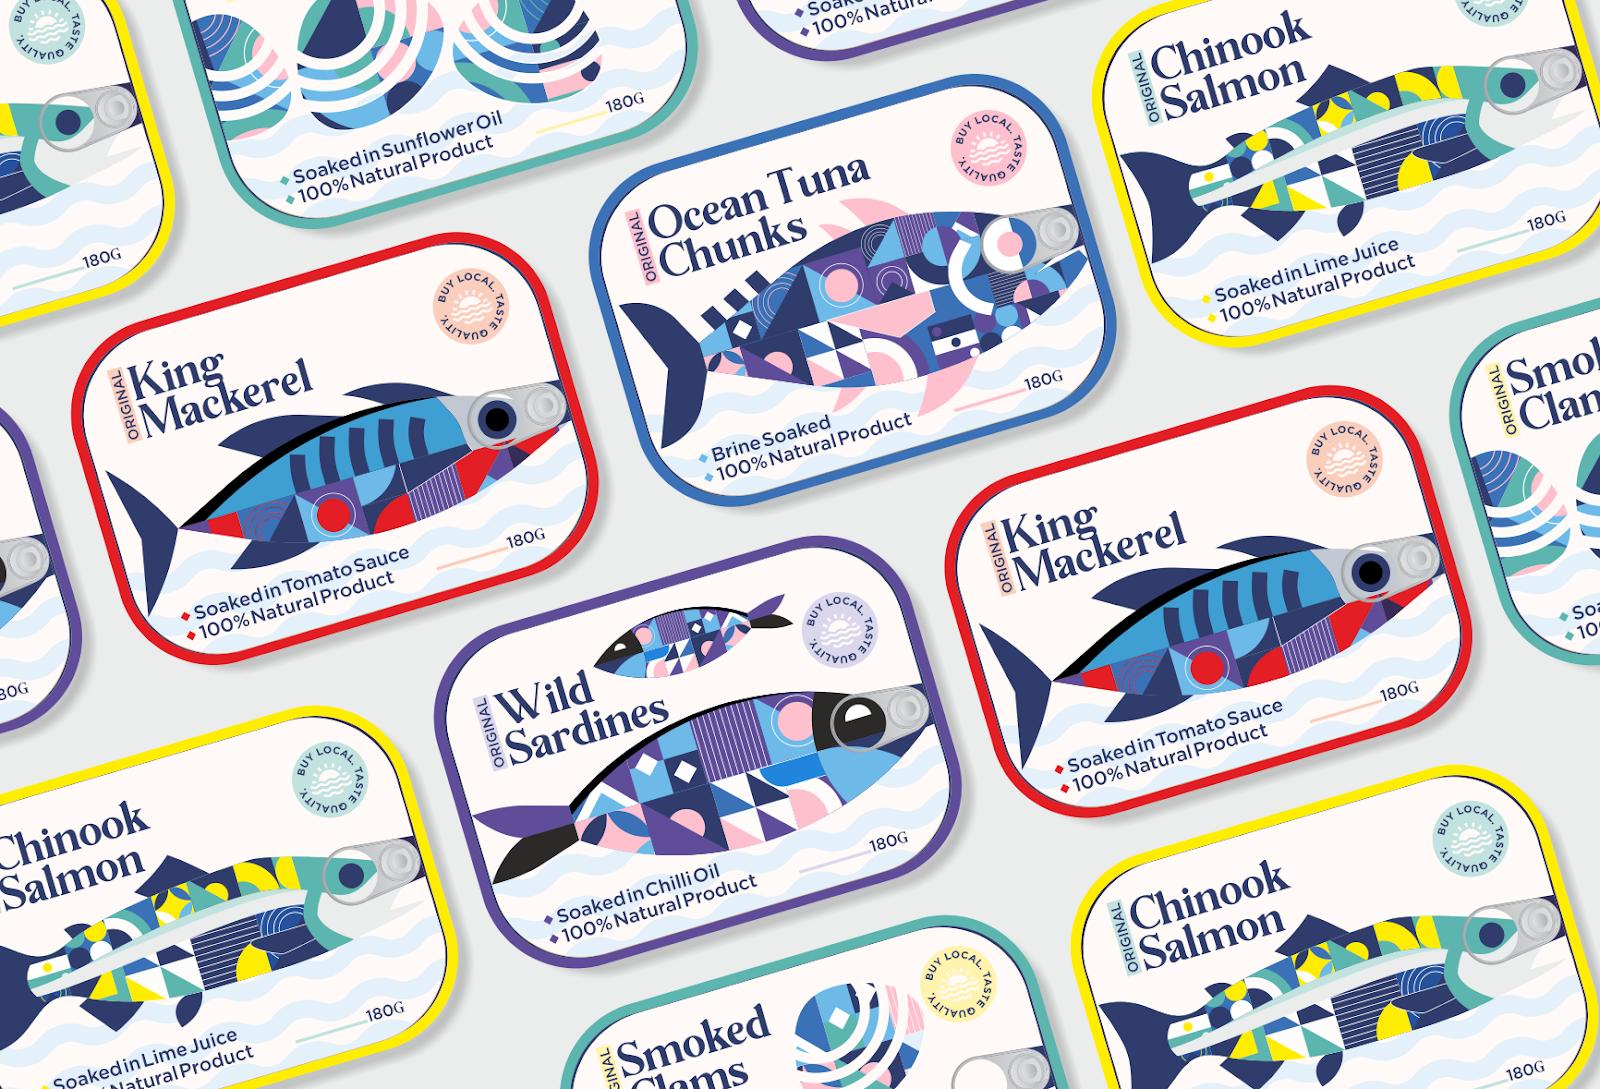 Conserves de poisson I Design (concept) : Linsanity Design, Inde (septembre 2020)